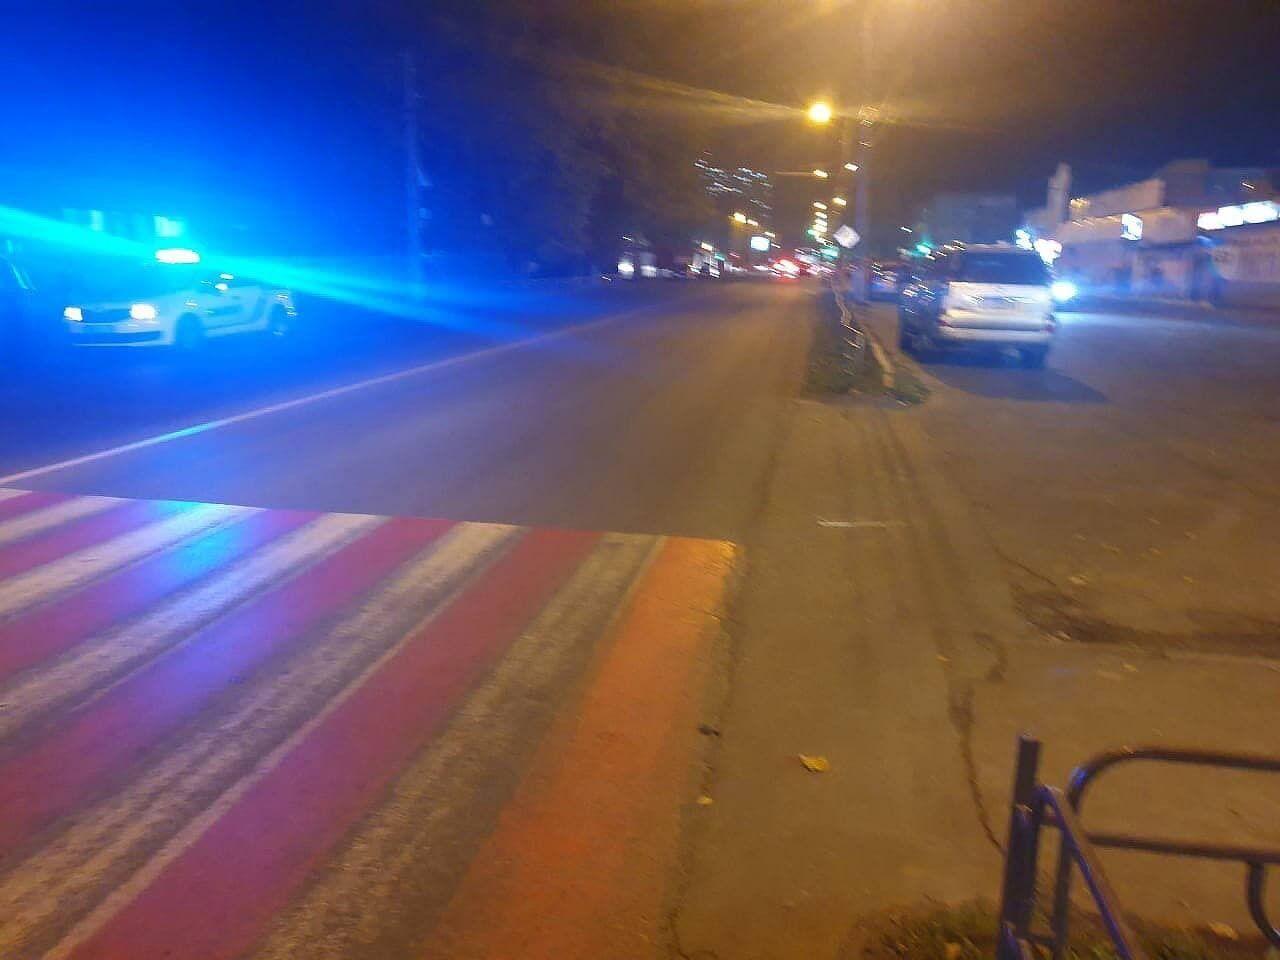 ДТП произошло в Борисполе